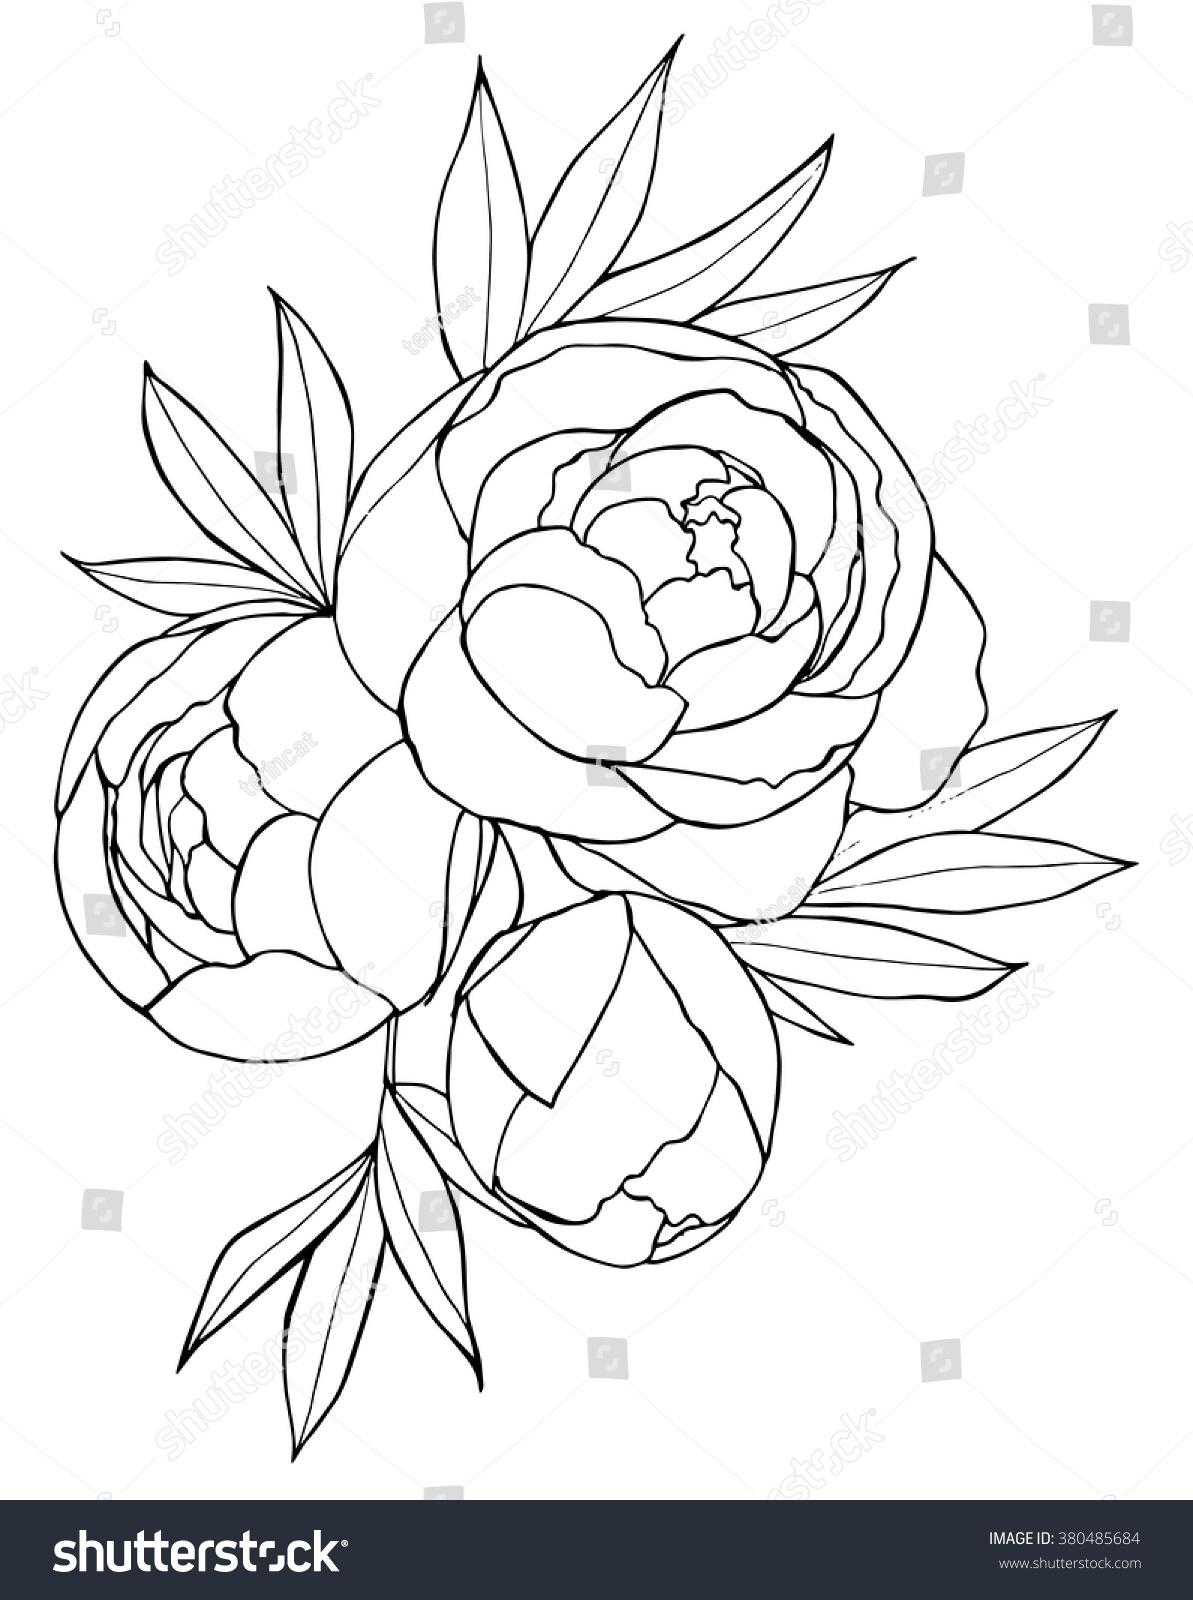 Black White Hand Drawn Illustration Peonies Stock Vector